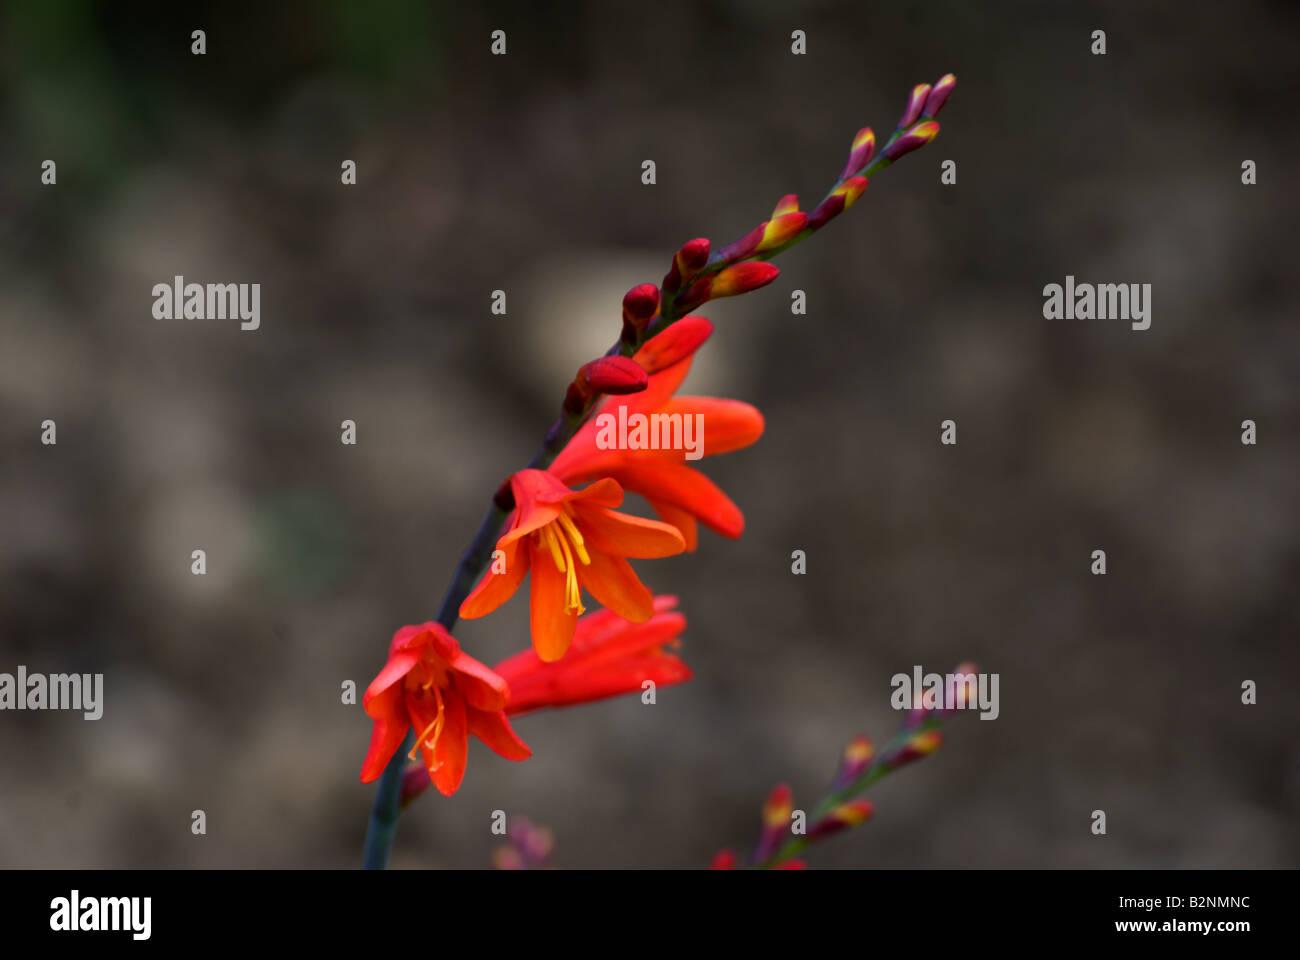 Crocosmia Iridaceae in bloom at Evologia gardens. - Stock Image